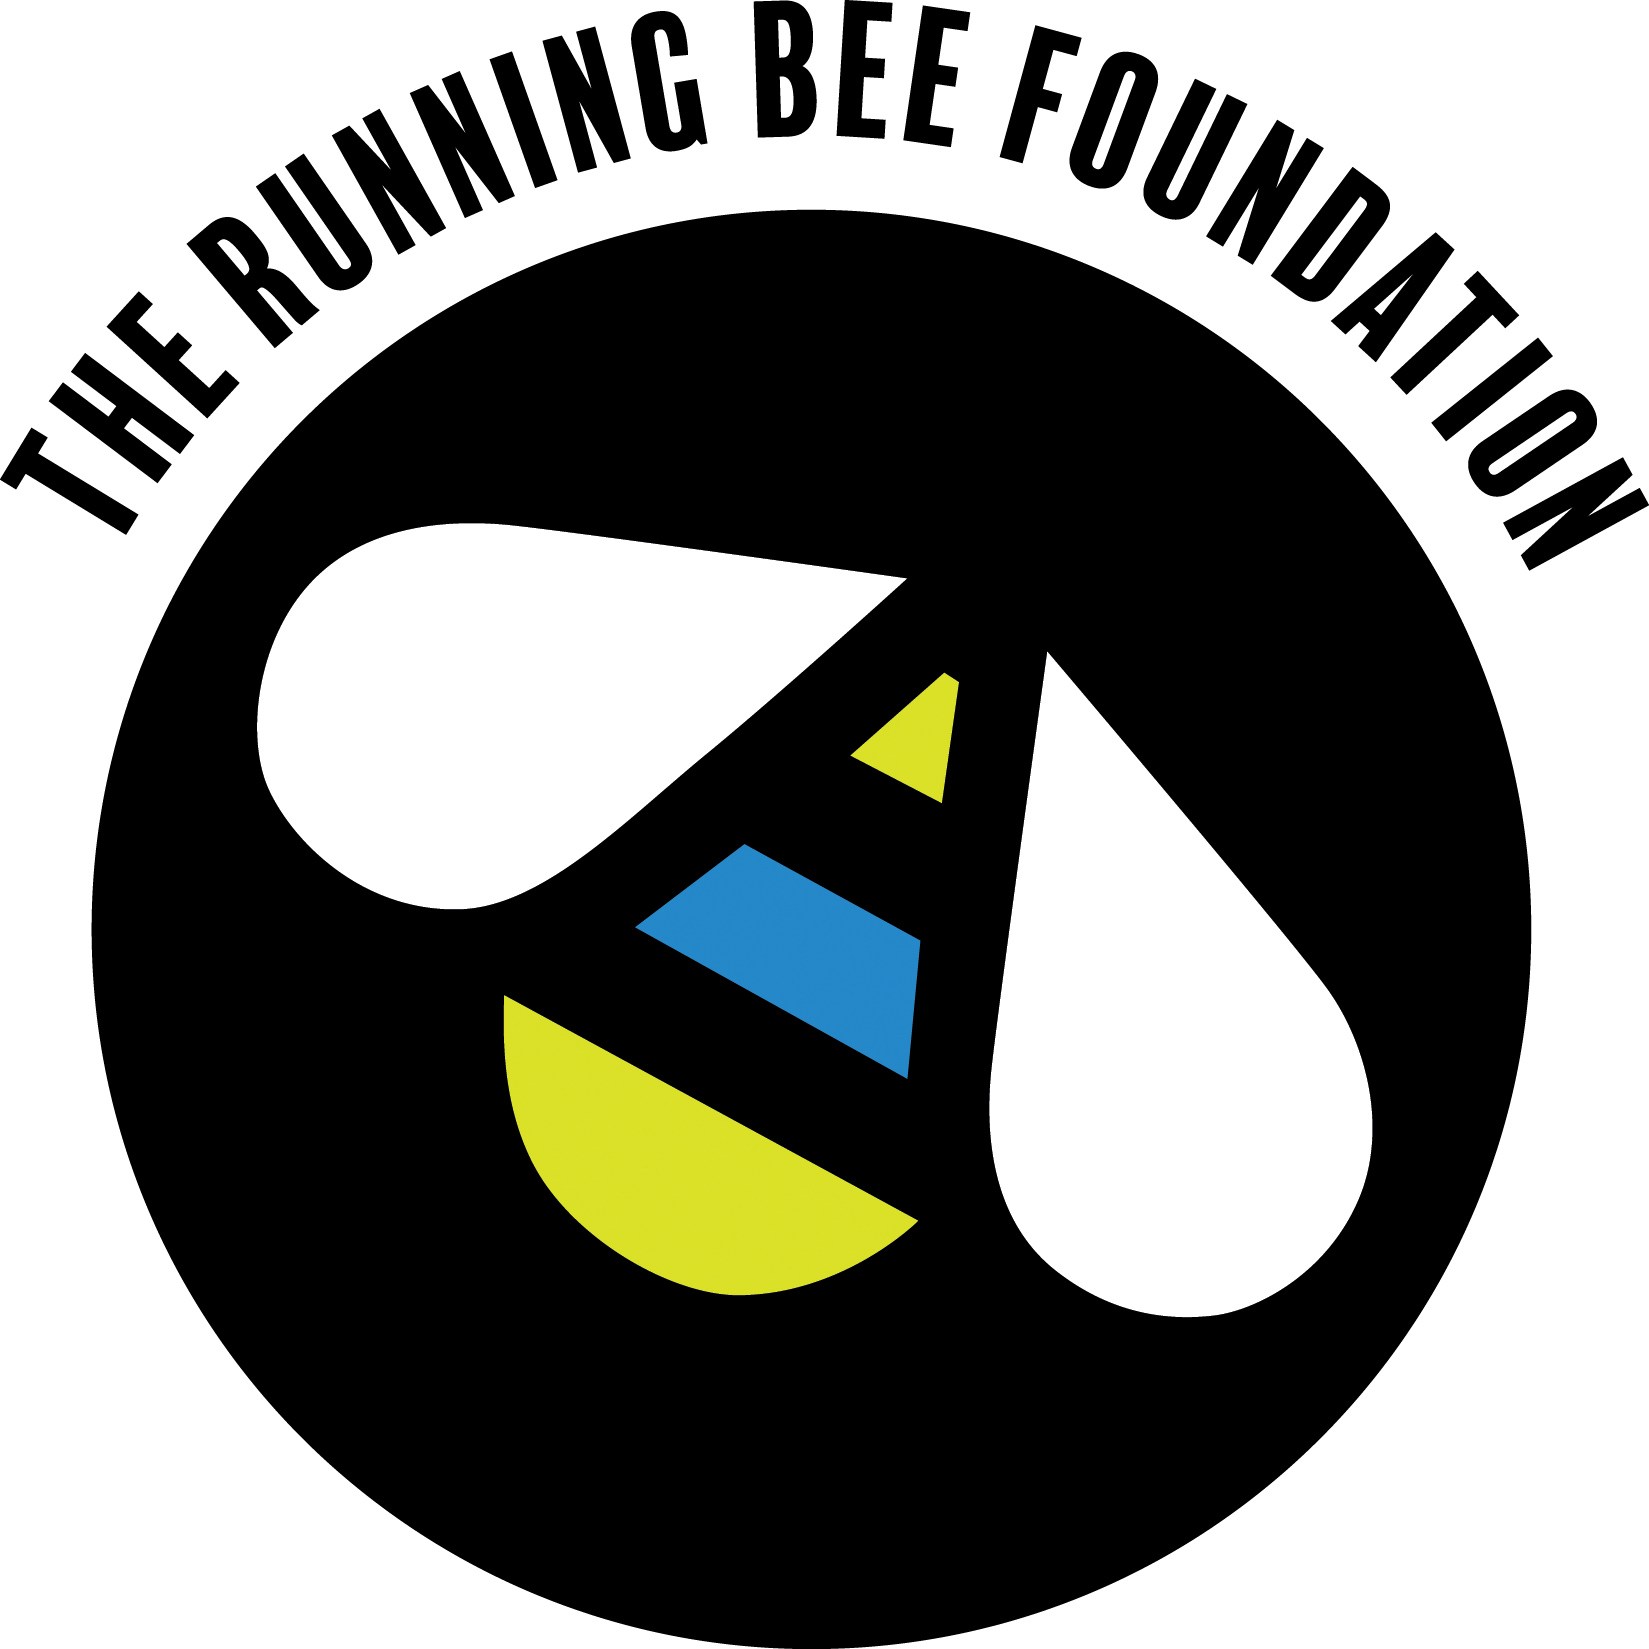 The Running Bee Foundation's logo